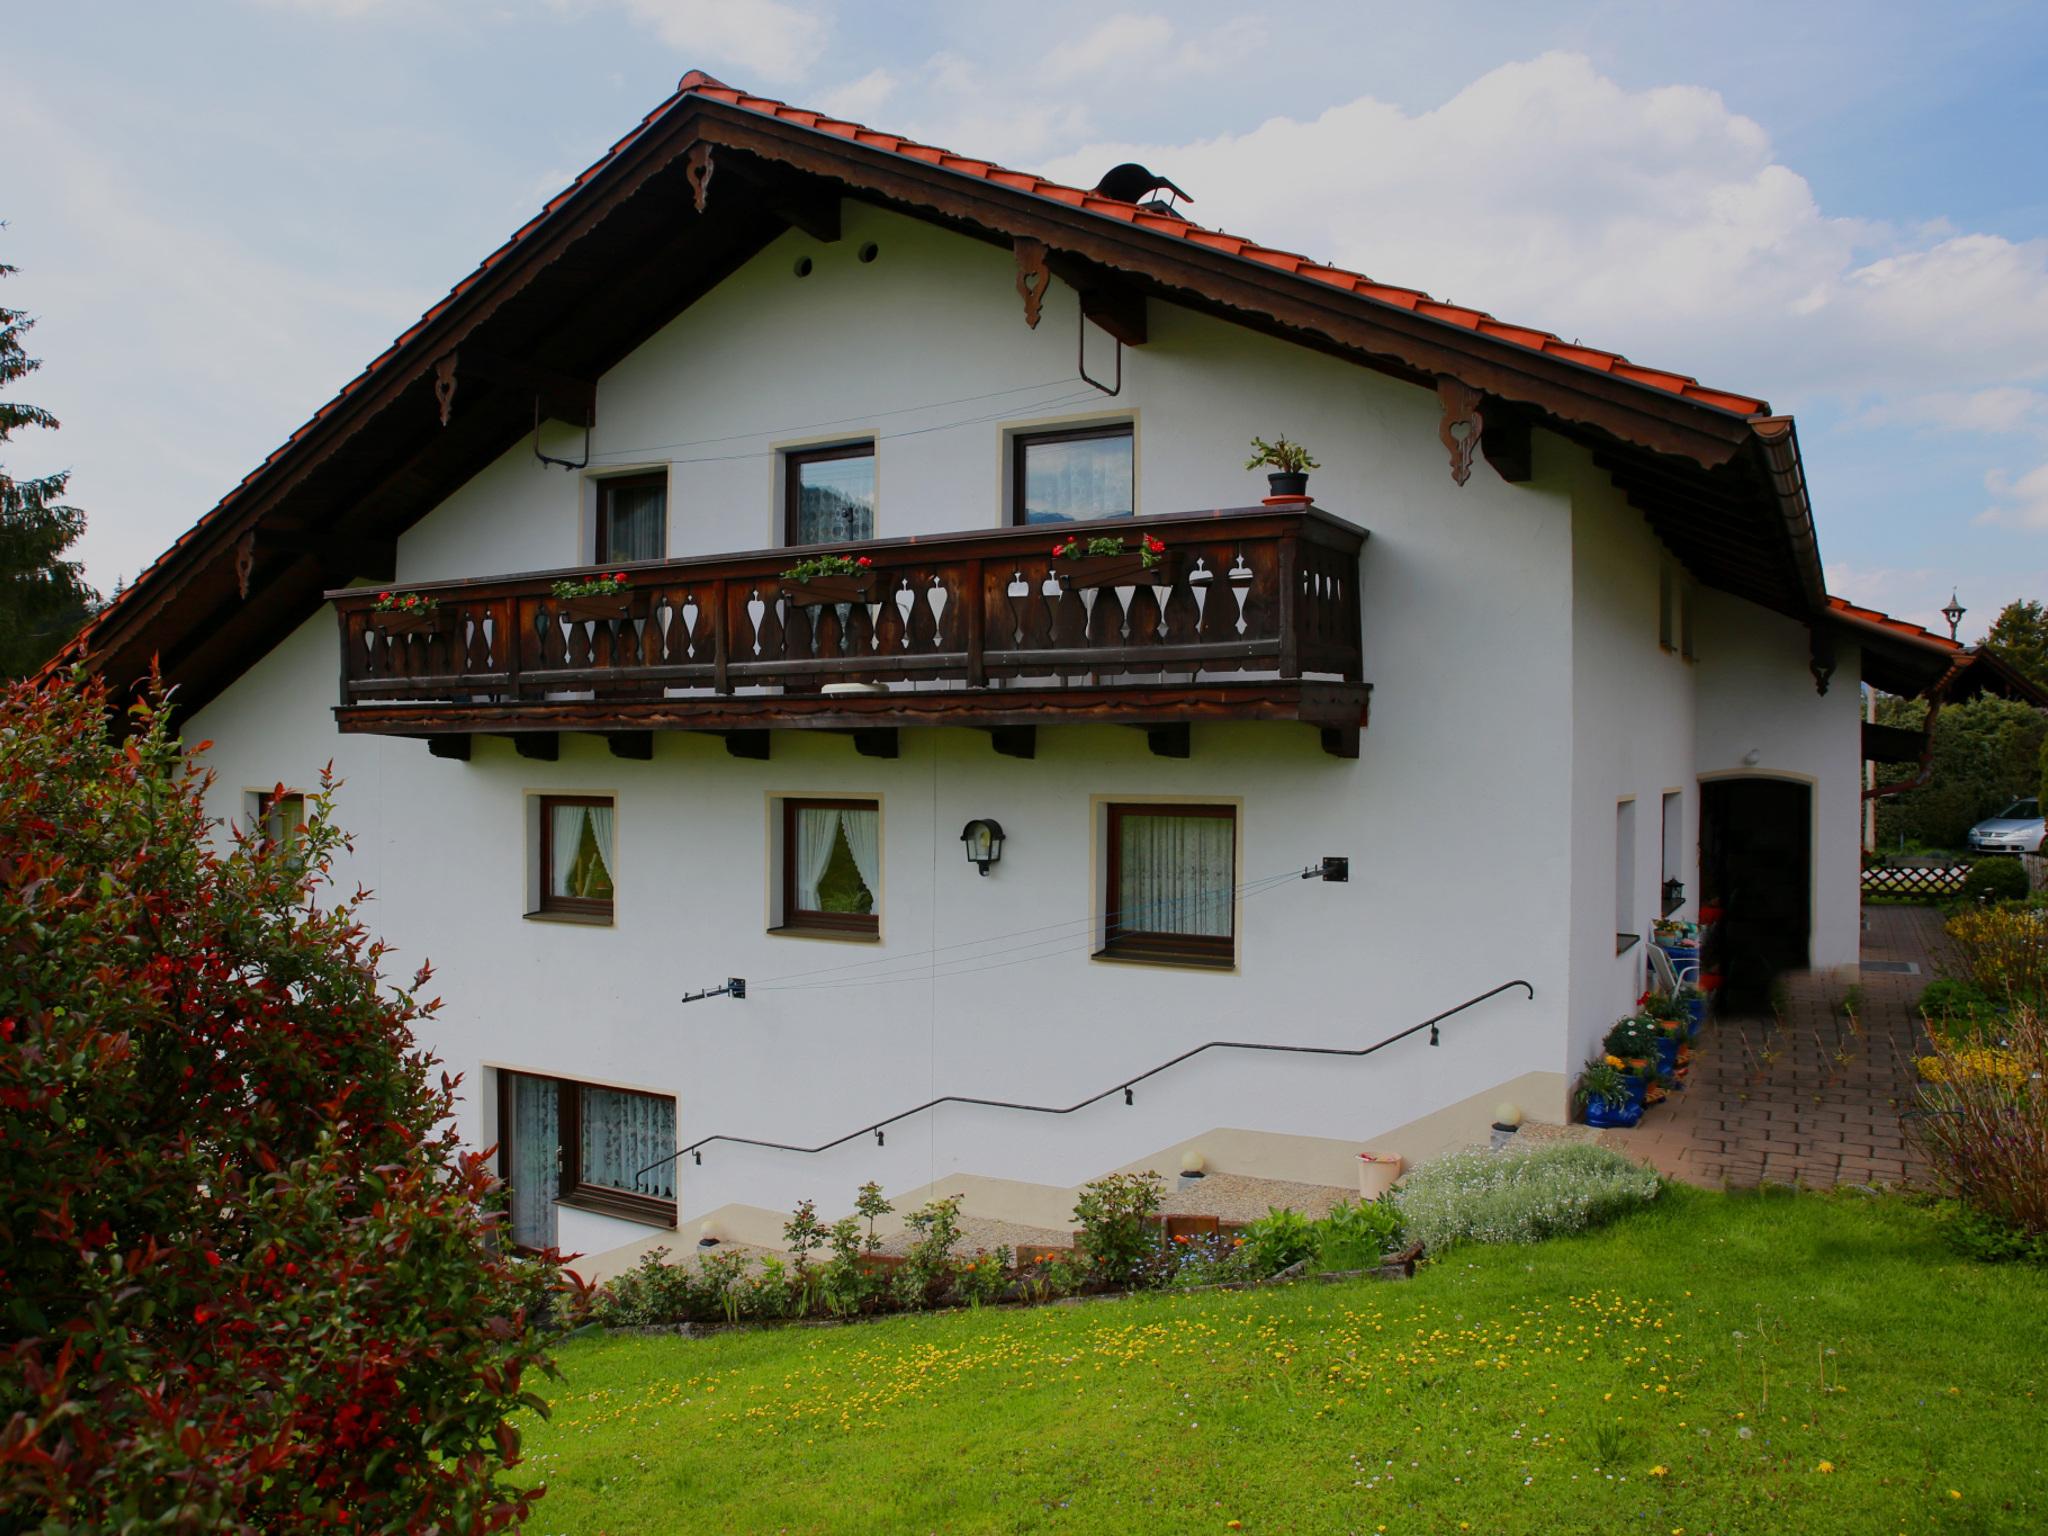 Haus Bergfrieden - Chiemgau Karte (DE Inzell). Fer